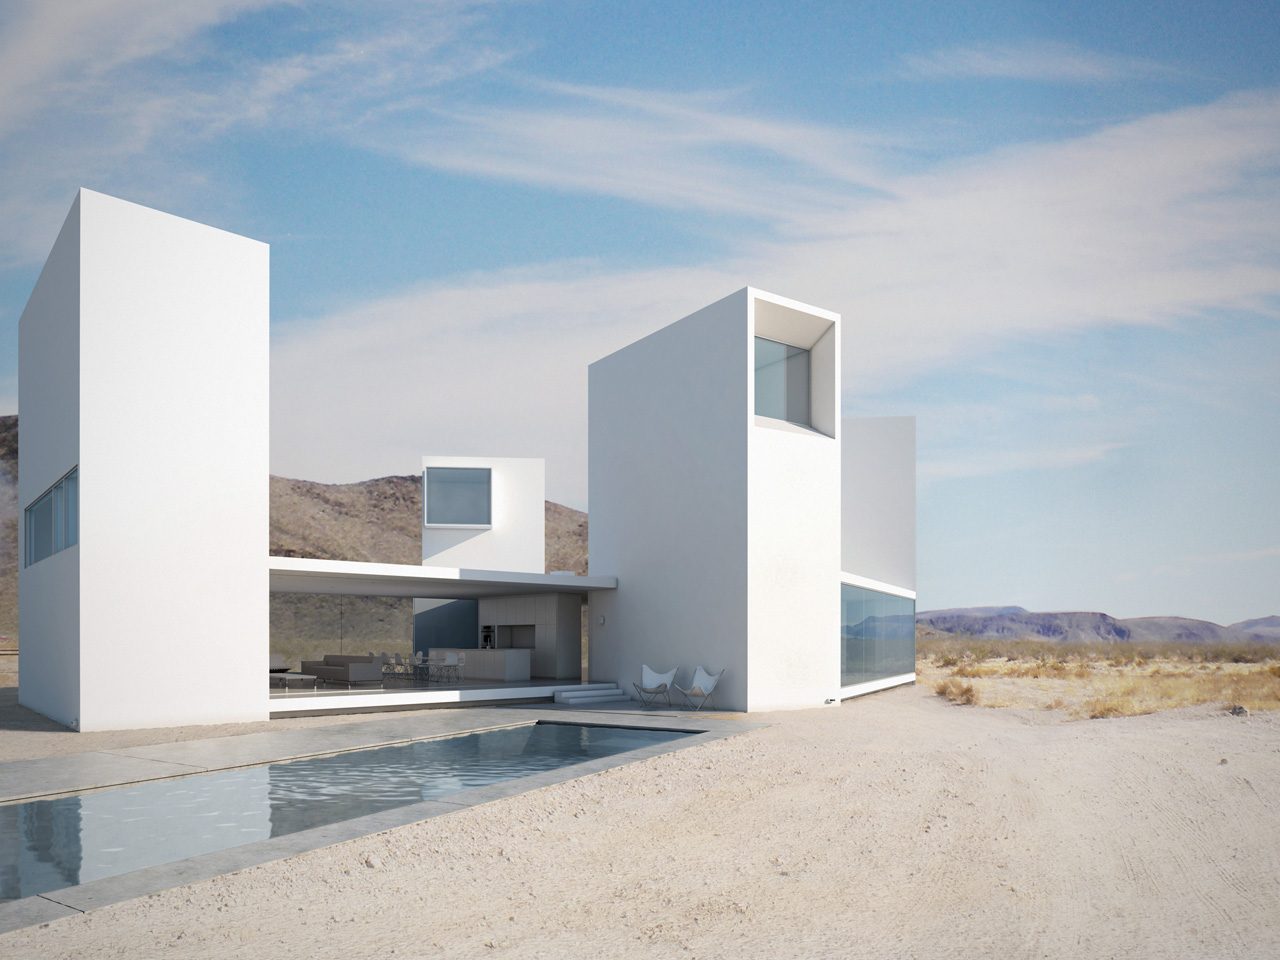 Casa Quatro Olhos / Edward Ogosta Architecture  , © Edward Ogosta Architecture